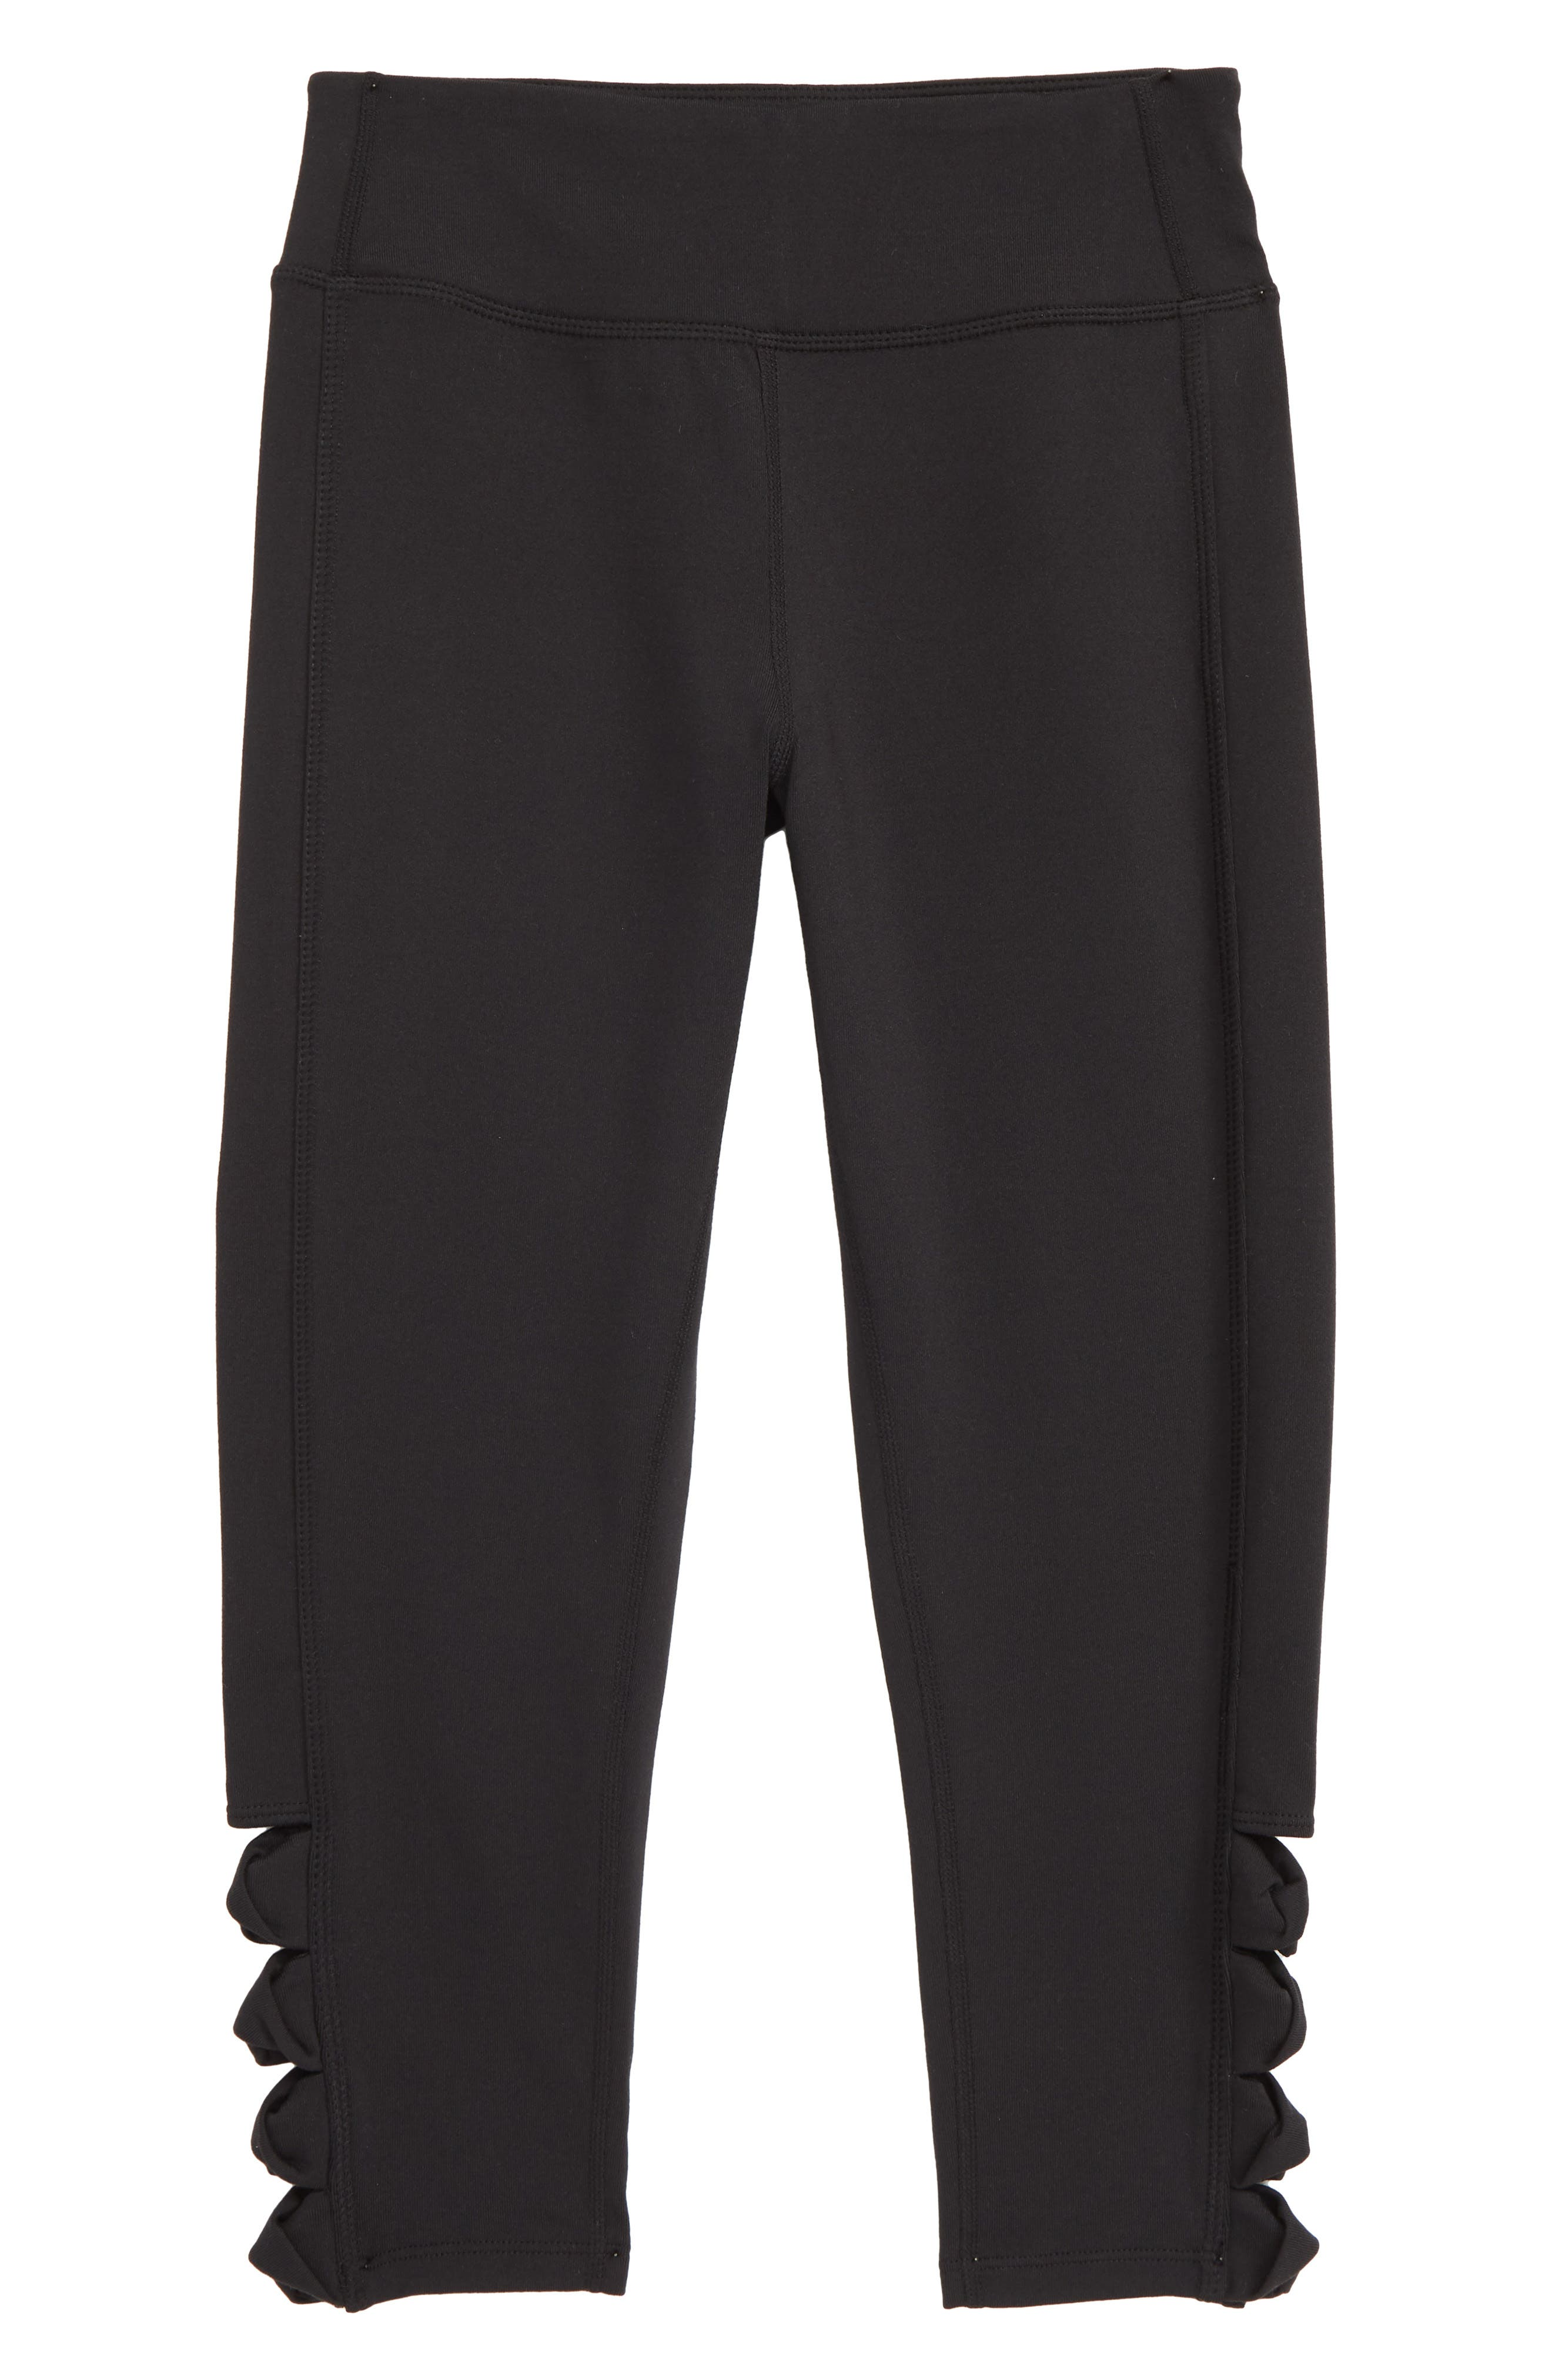 ZELLA GIRL Side Twist Crop Leggings, Main, color, BLACK